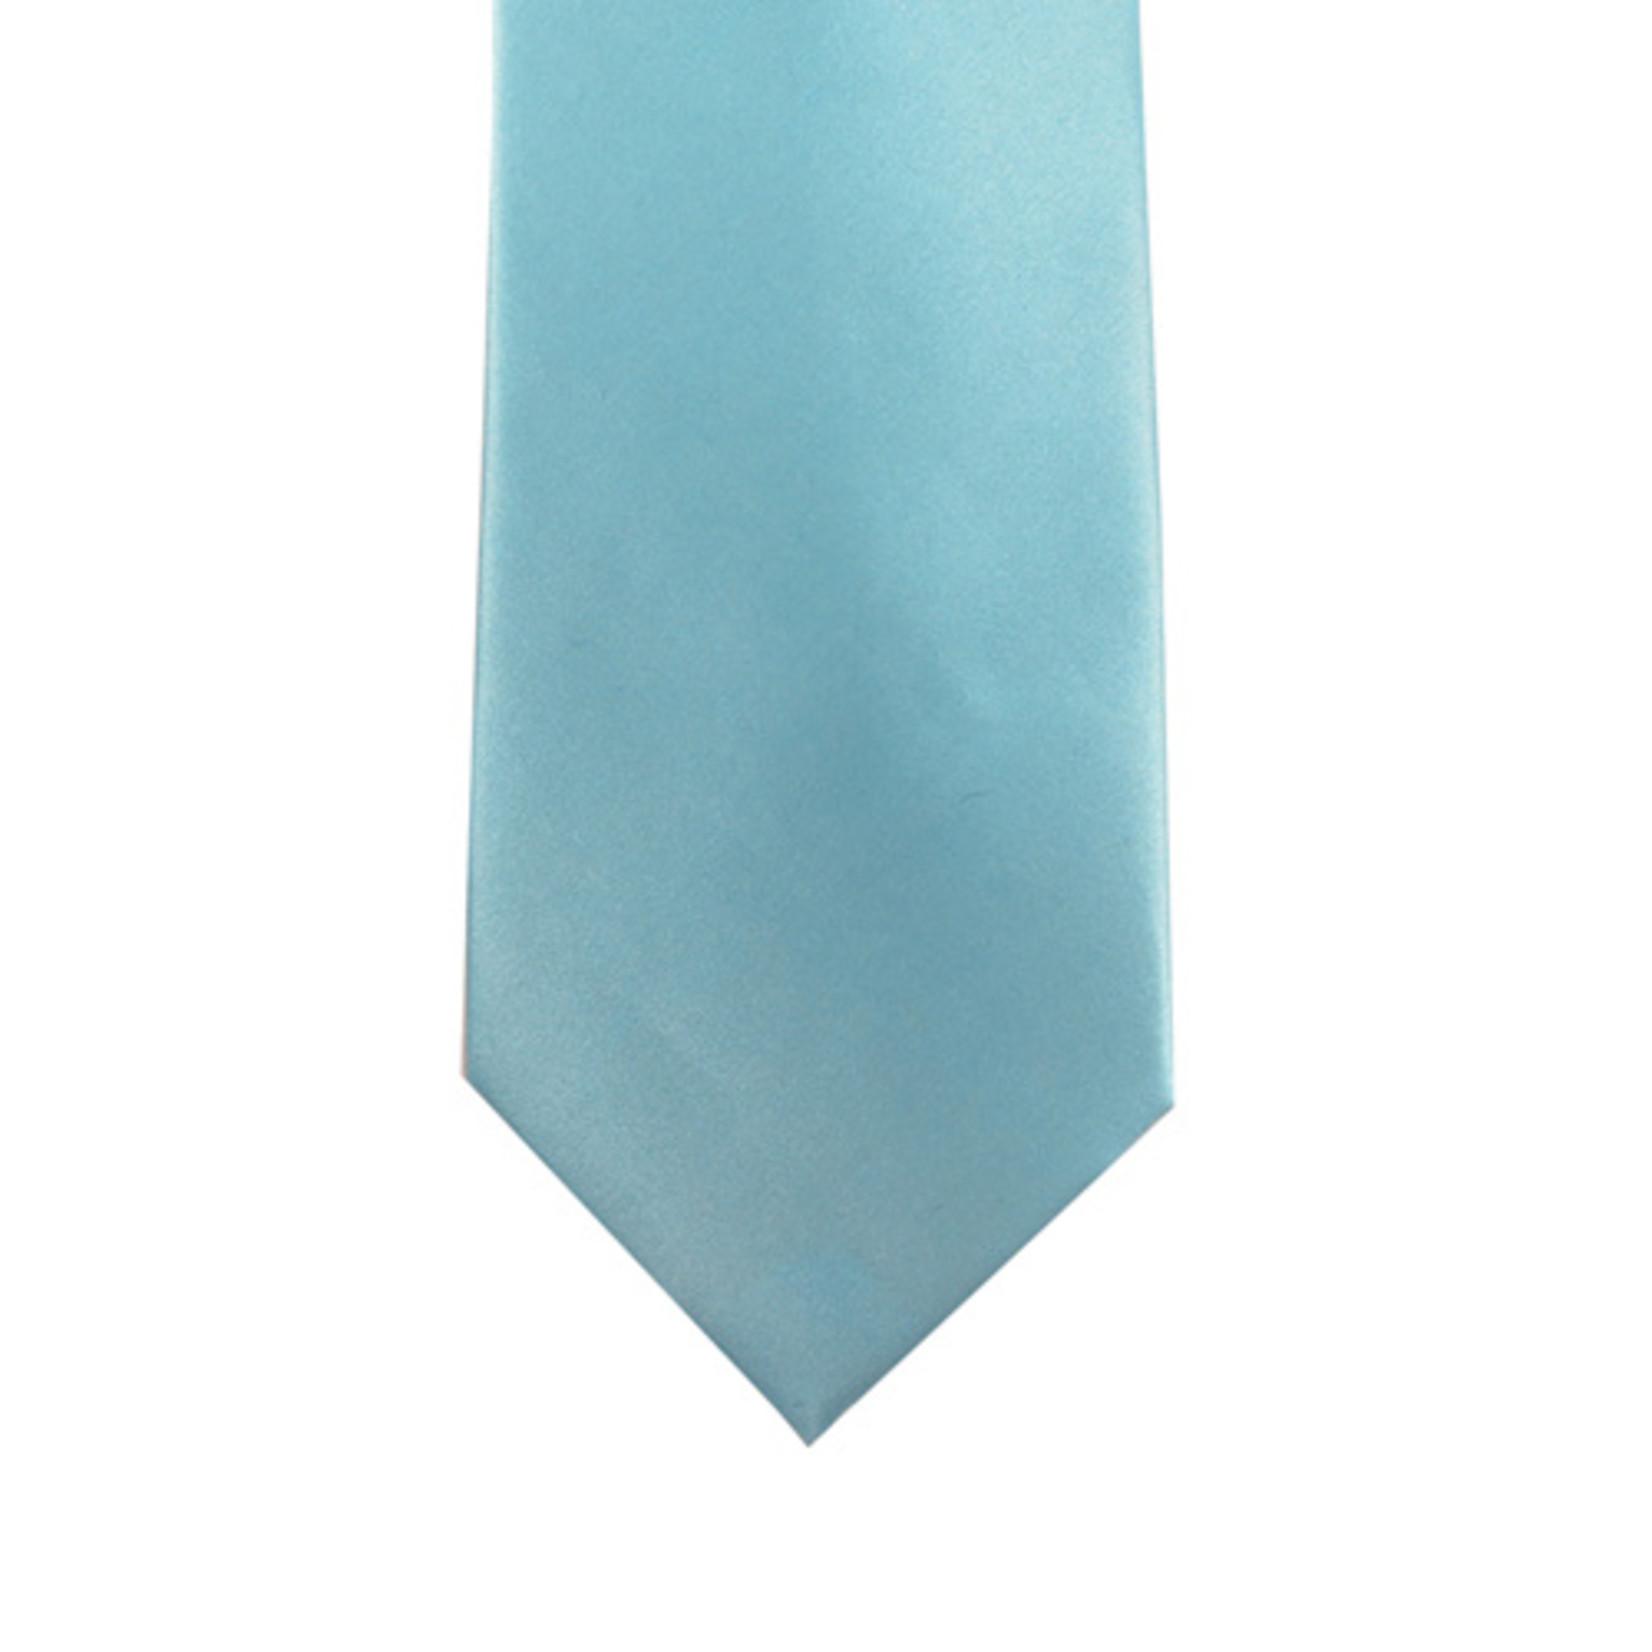 Knotz M100-43 Solid Aqua Tie